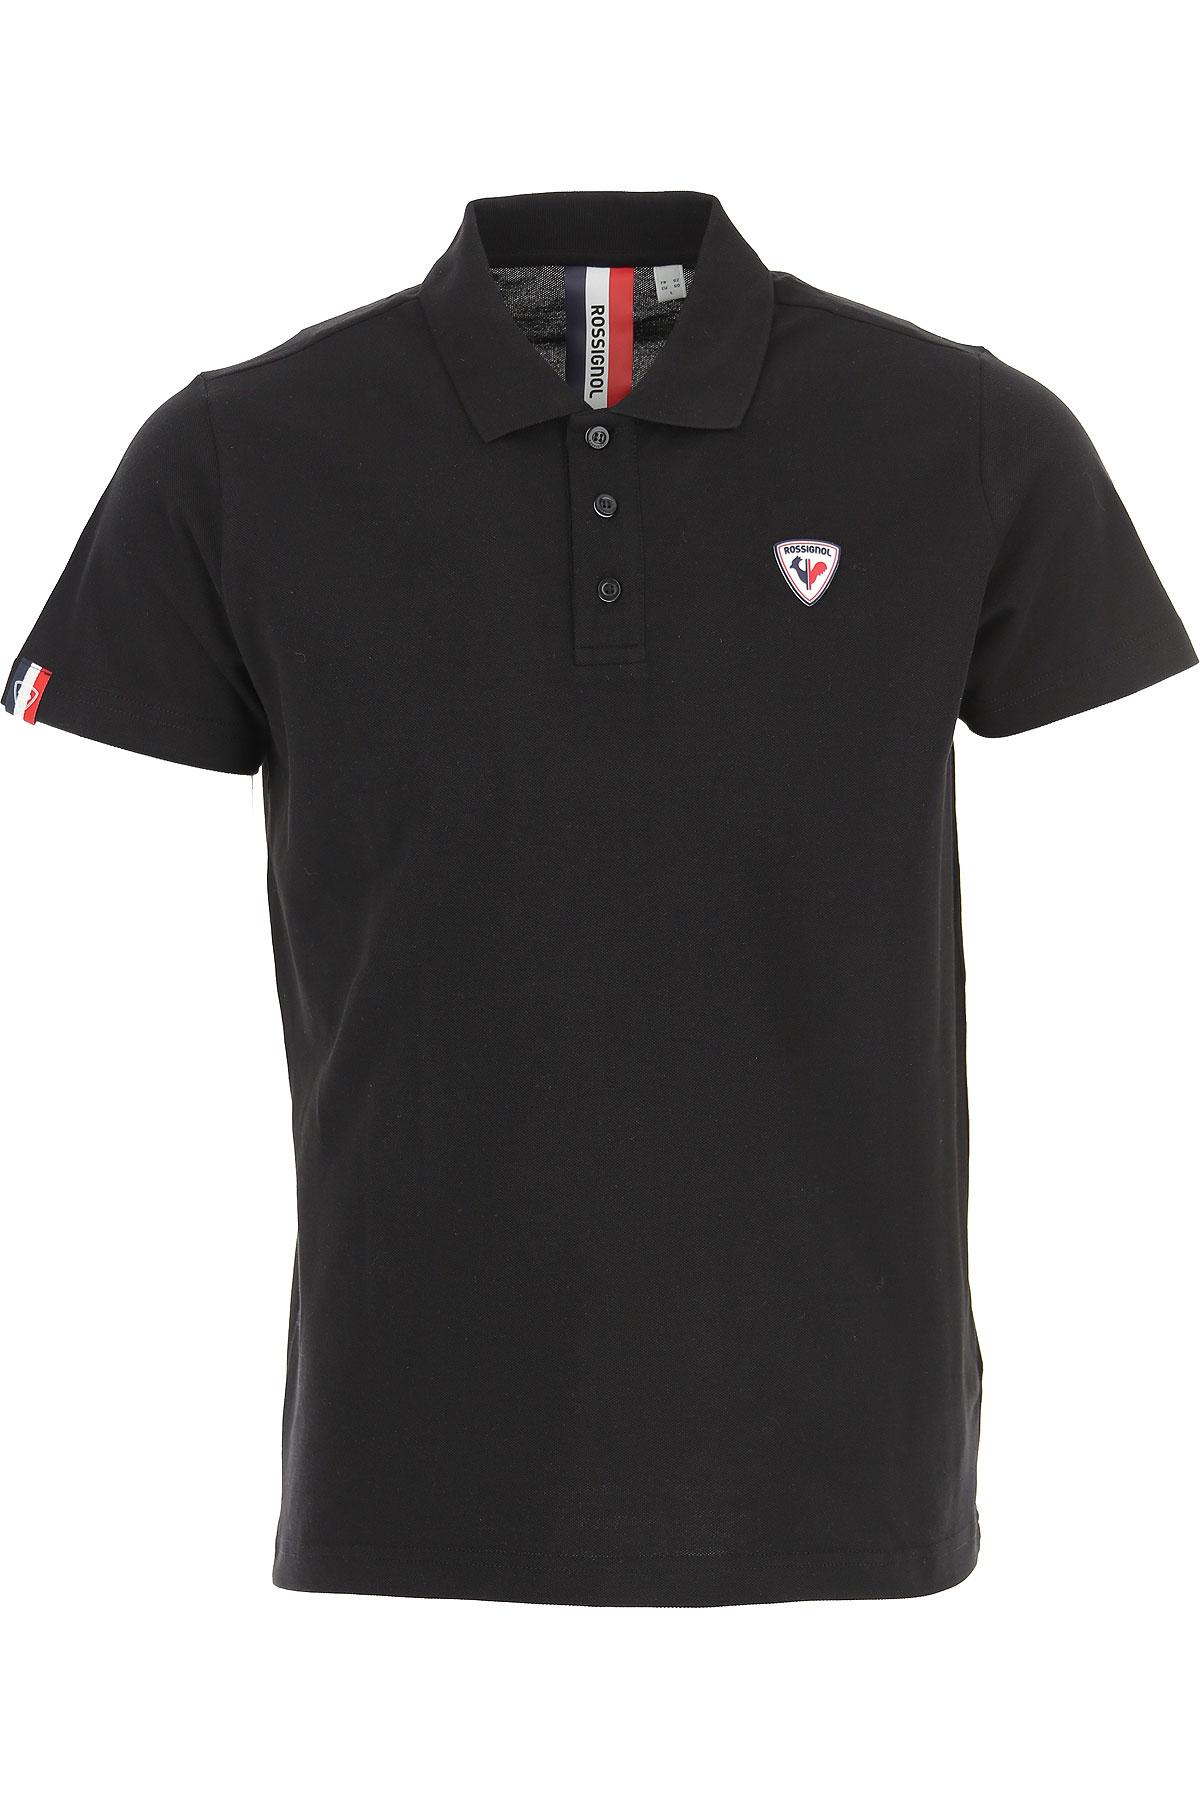 Rossignol Polo Shirt for Men On Sale, Black, Cotton, 2019, L M S XL